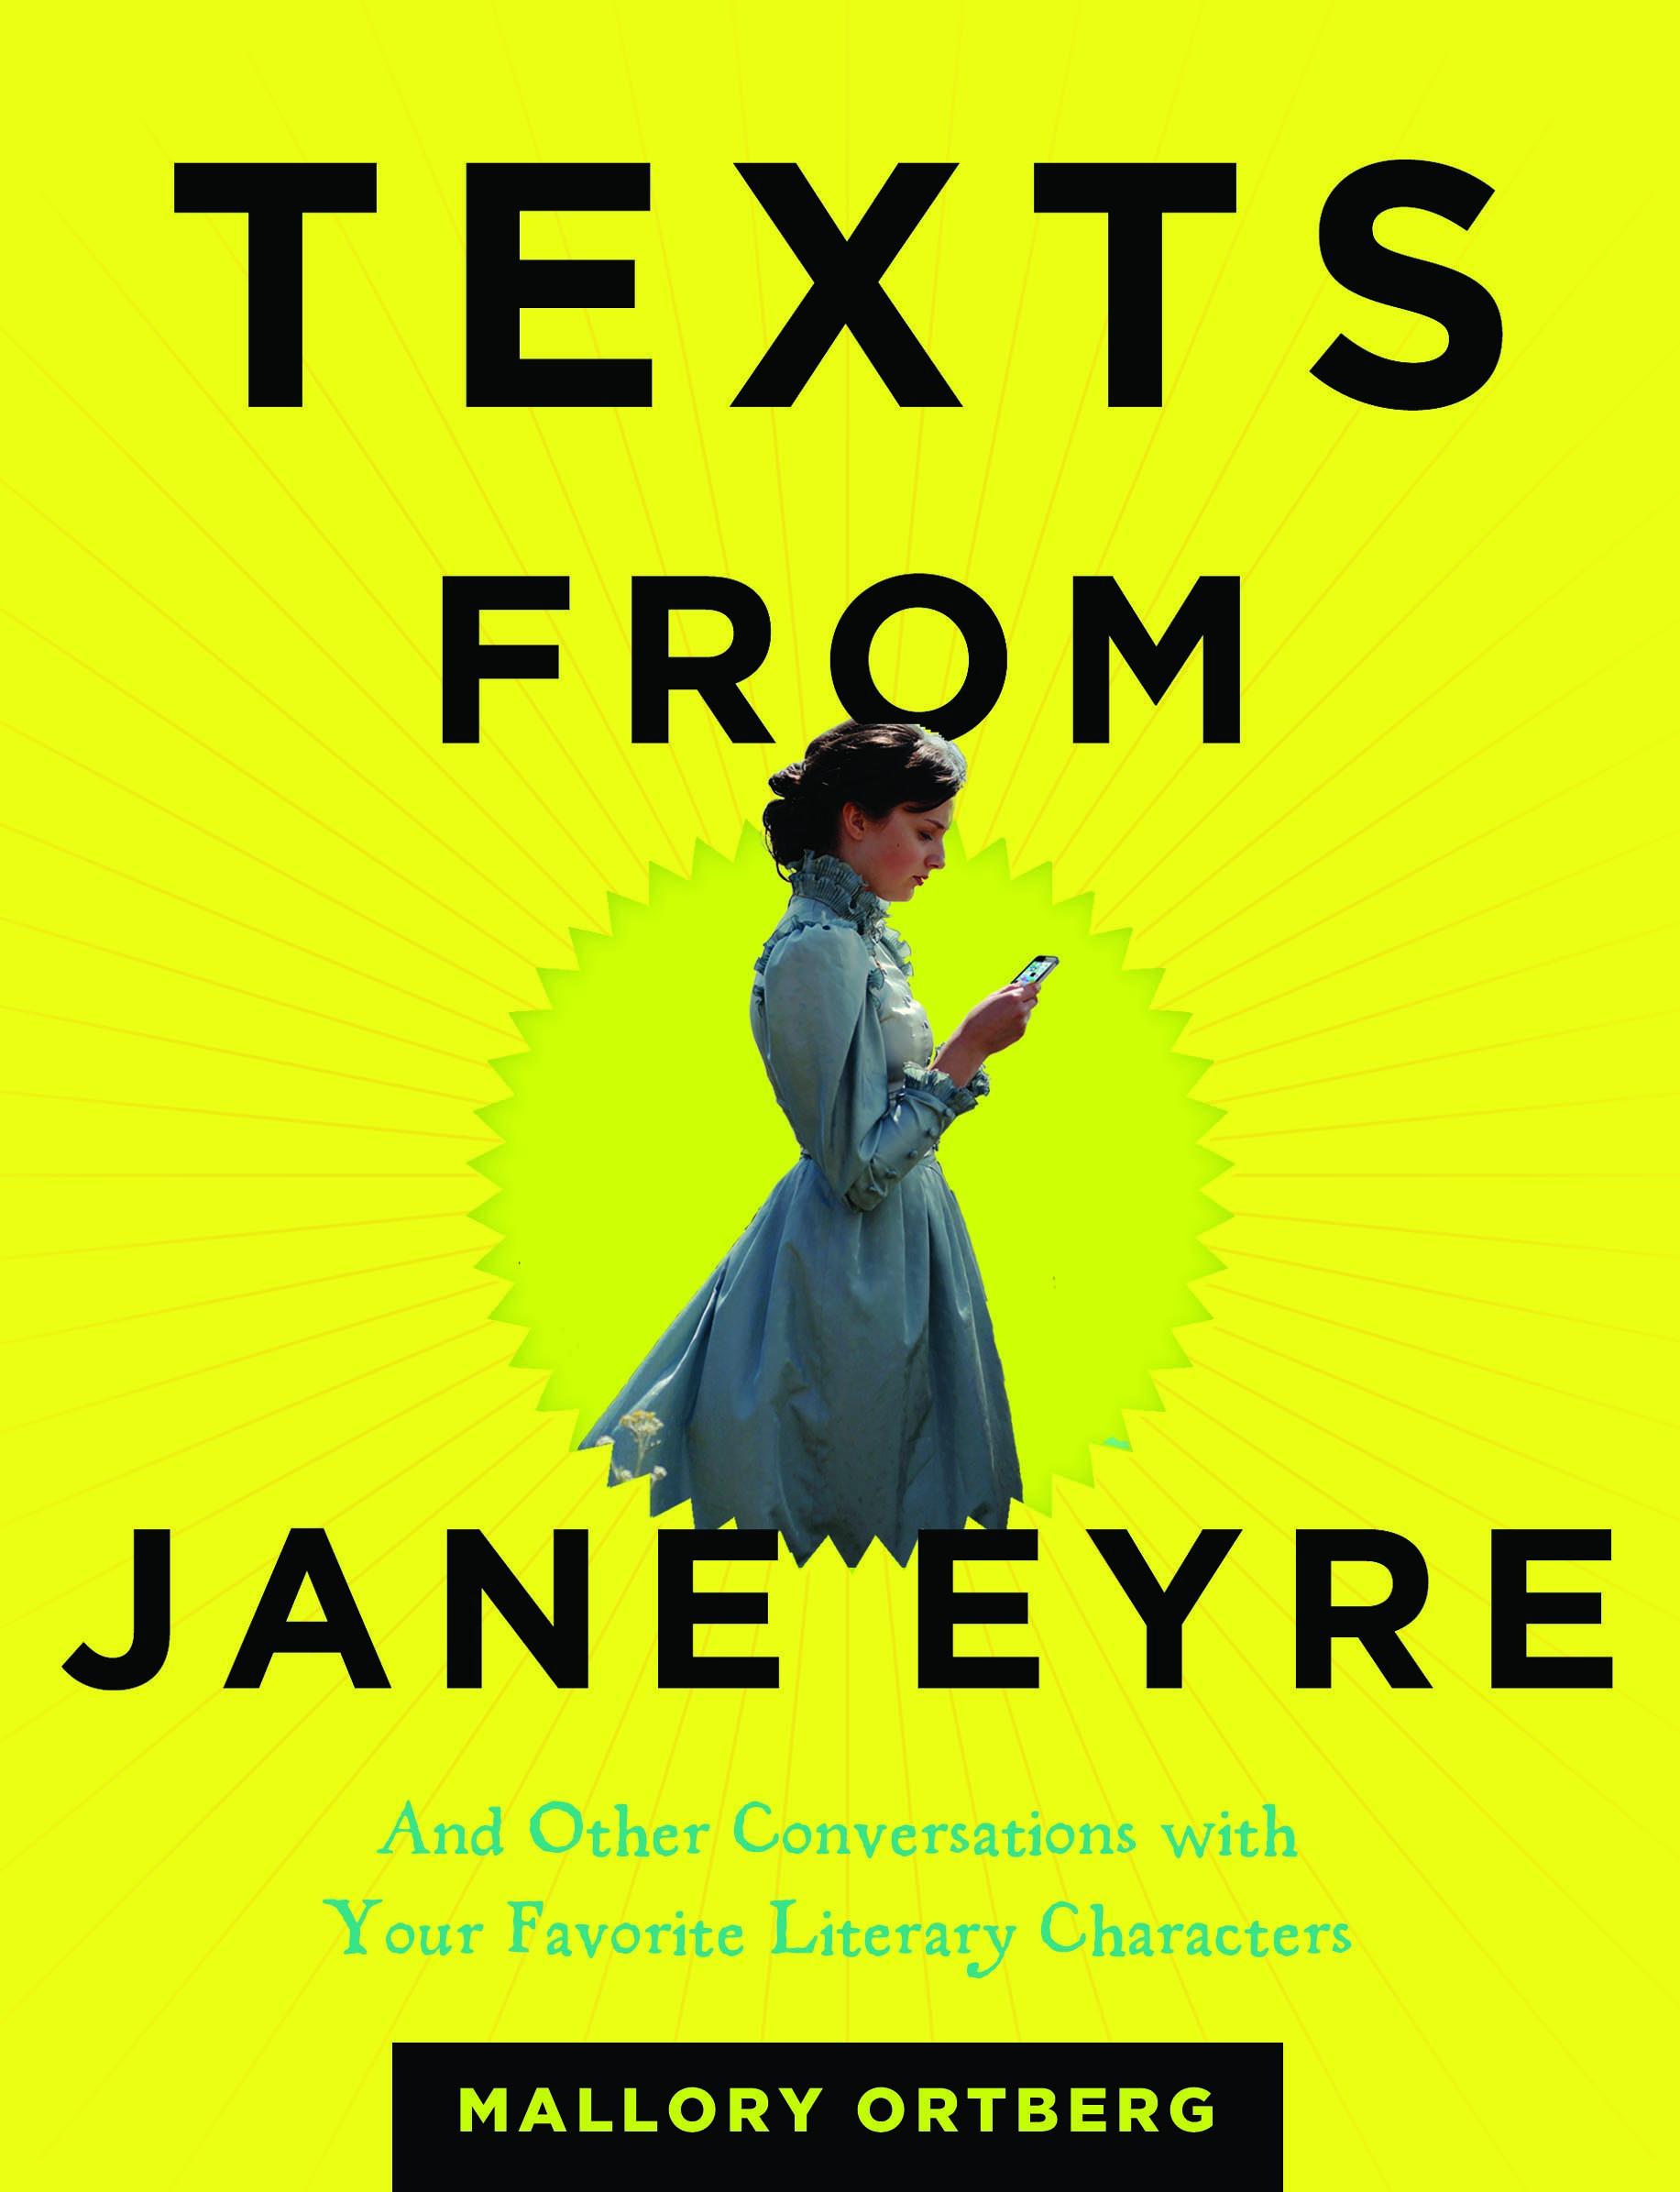 TextsFromJaneEyre_Ortberg.jpg